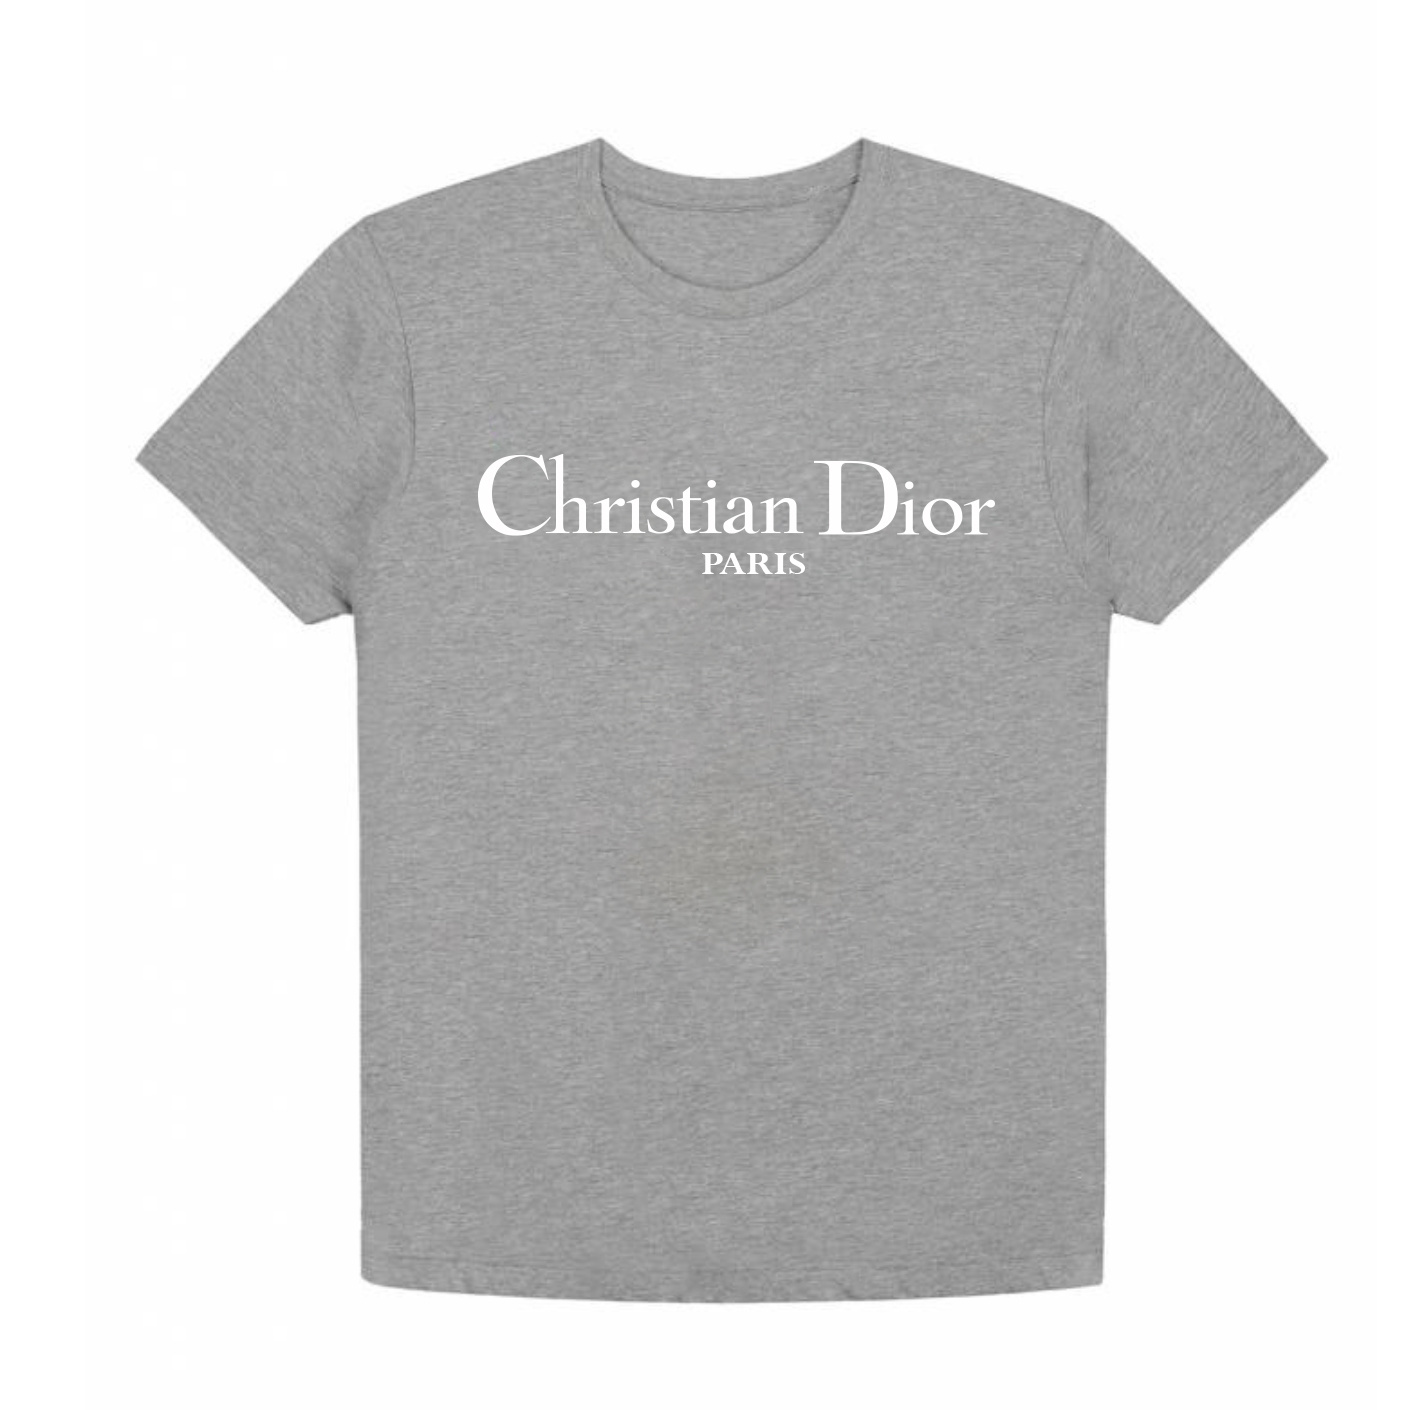 Cd paris grey